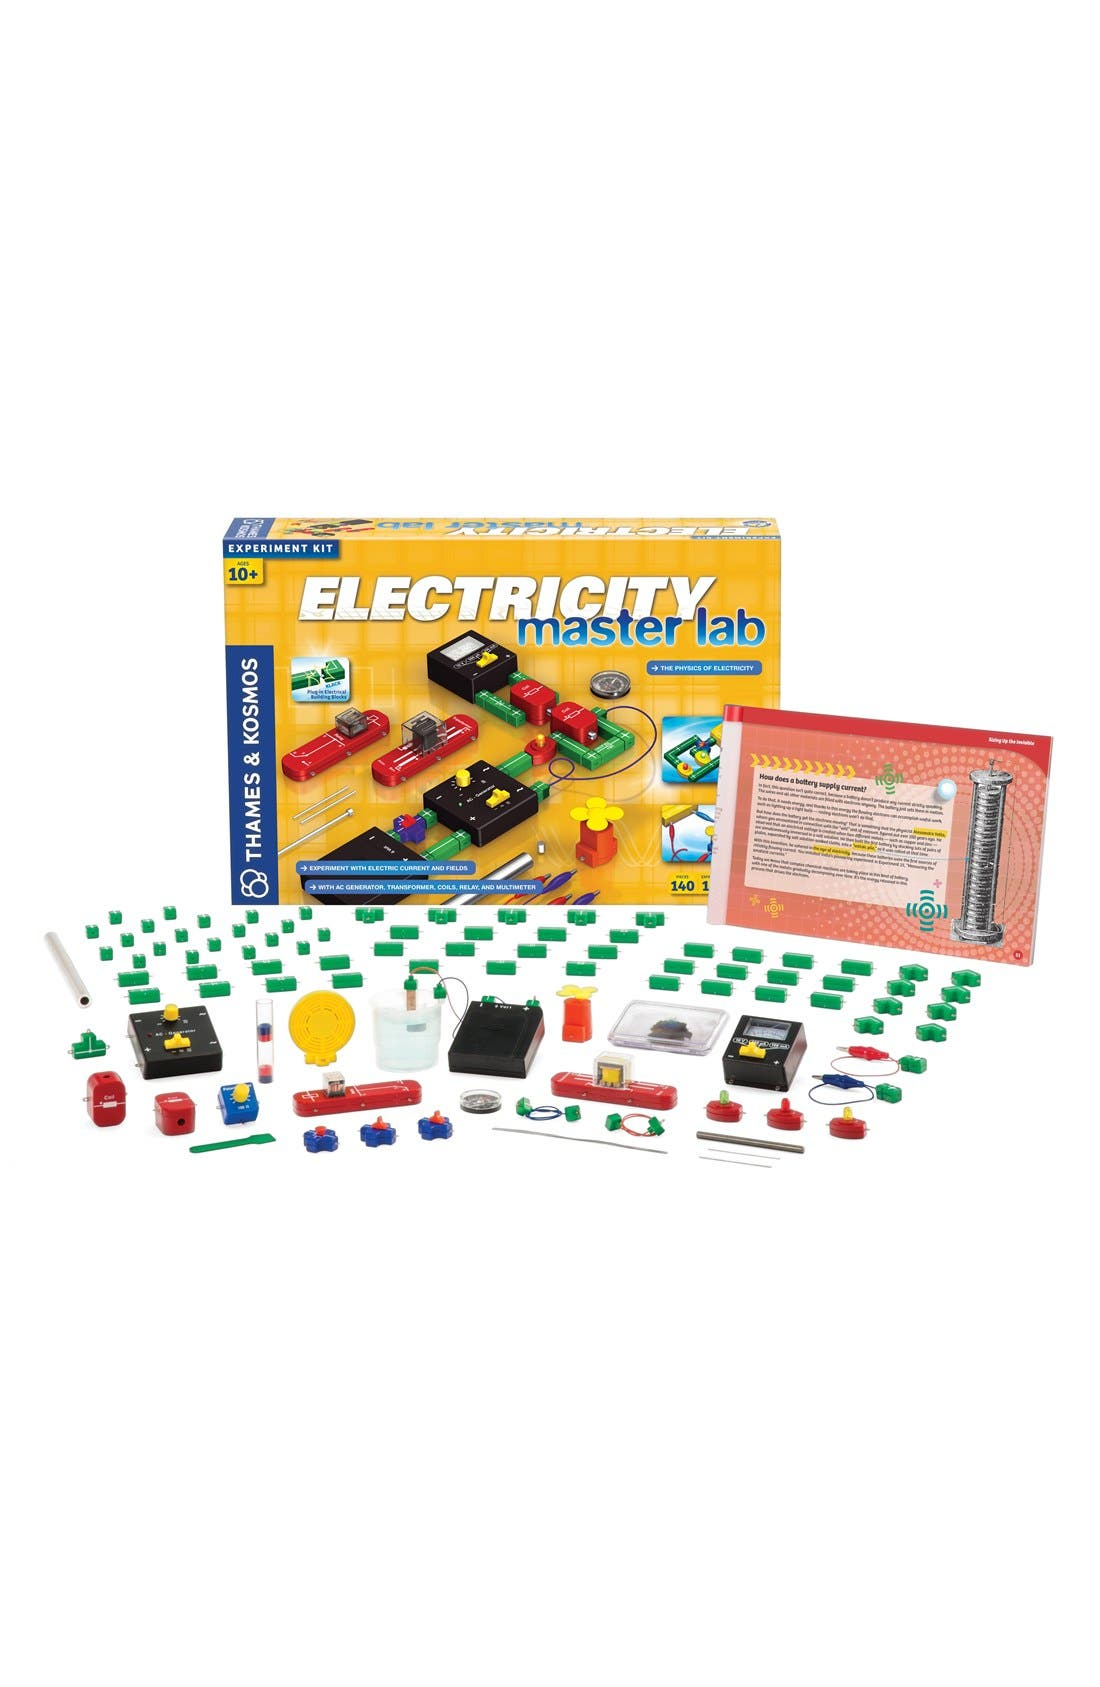 'Electricity Master Lab' Experiment Kit,                             Main thumbnail 1, color,                             NO COLOR